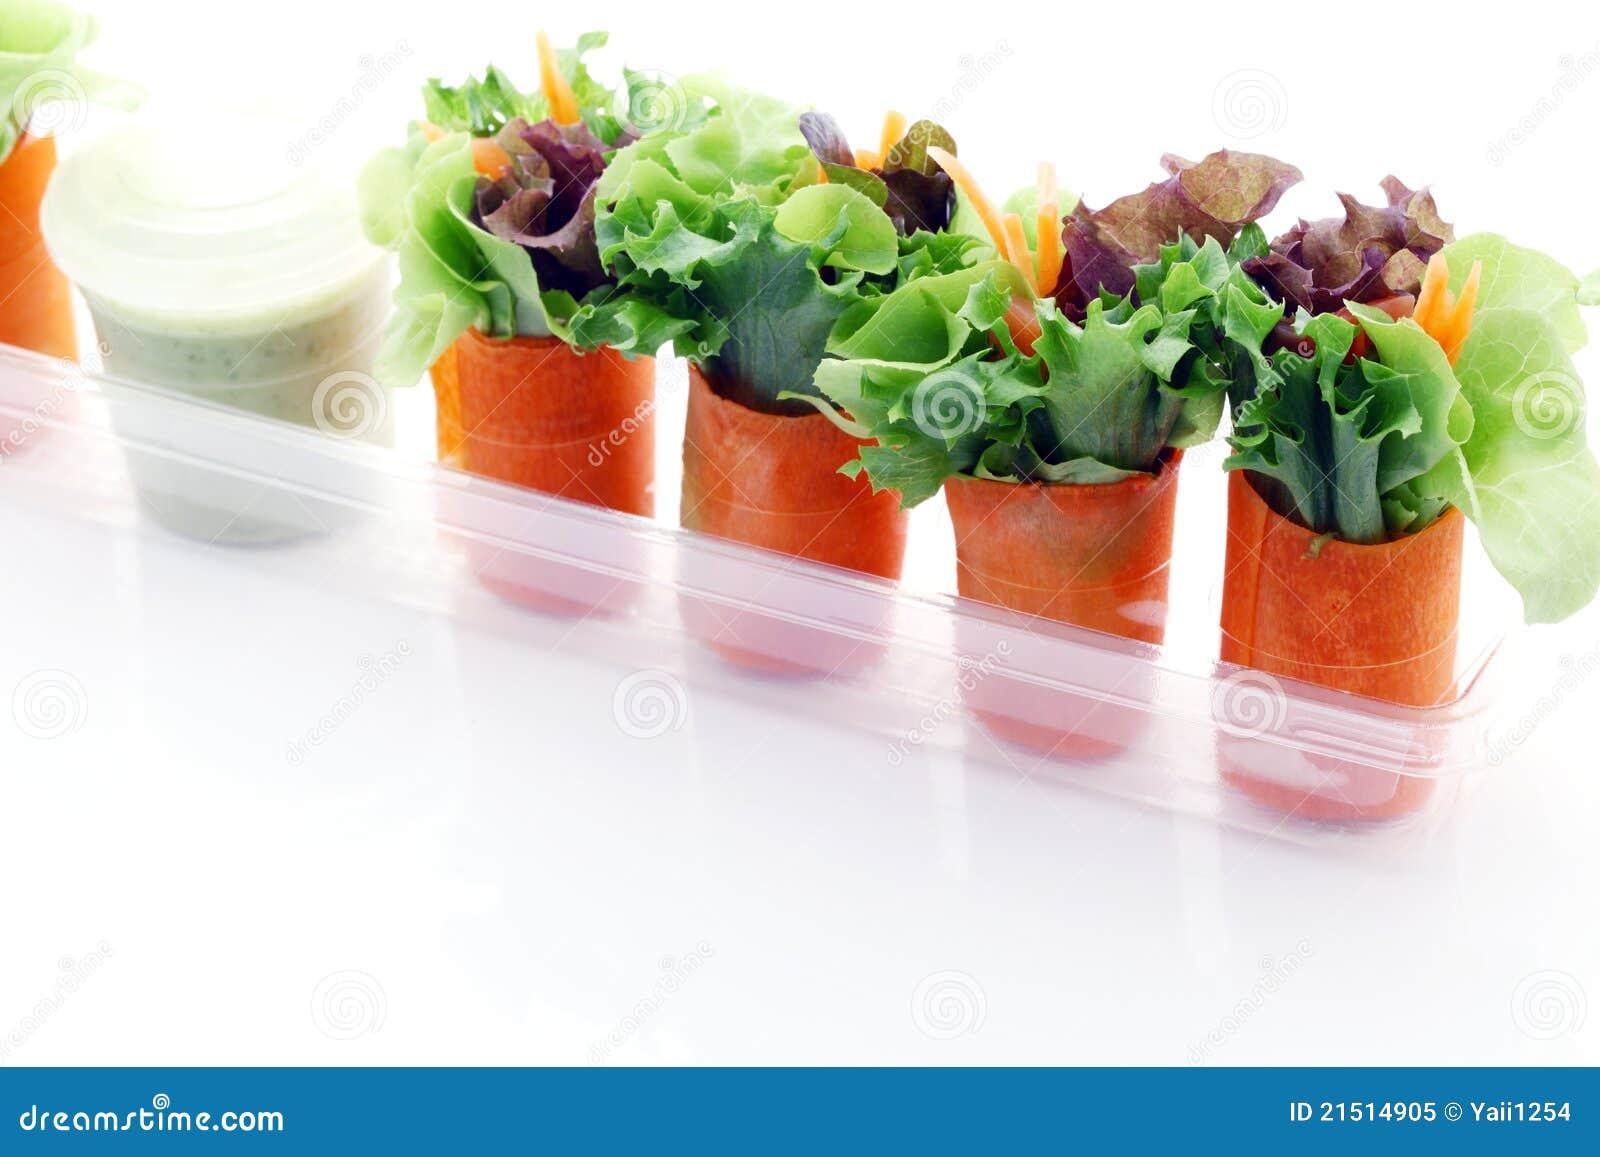 mini salad stock image image of salad orange carrots 21514905. Black Bedroom Furniture Sets. Home Design Ideas